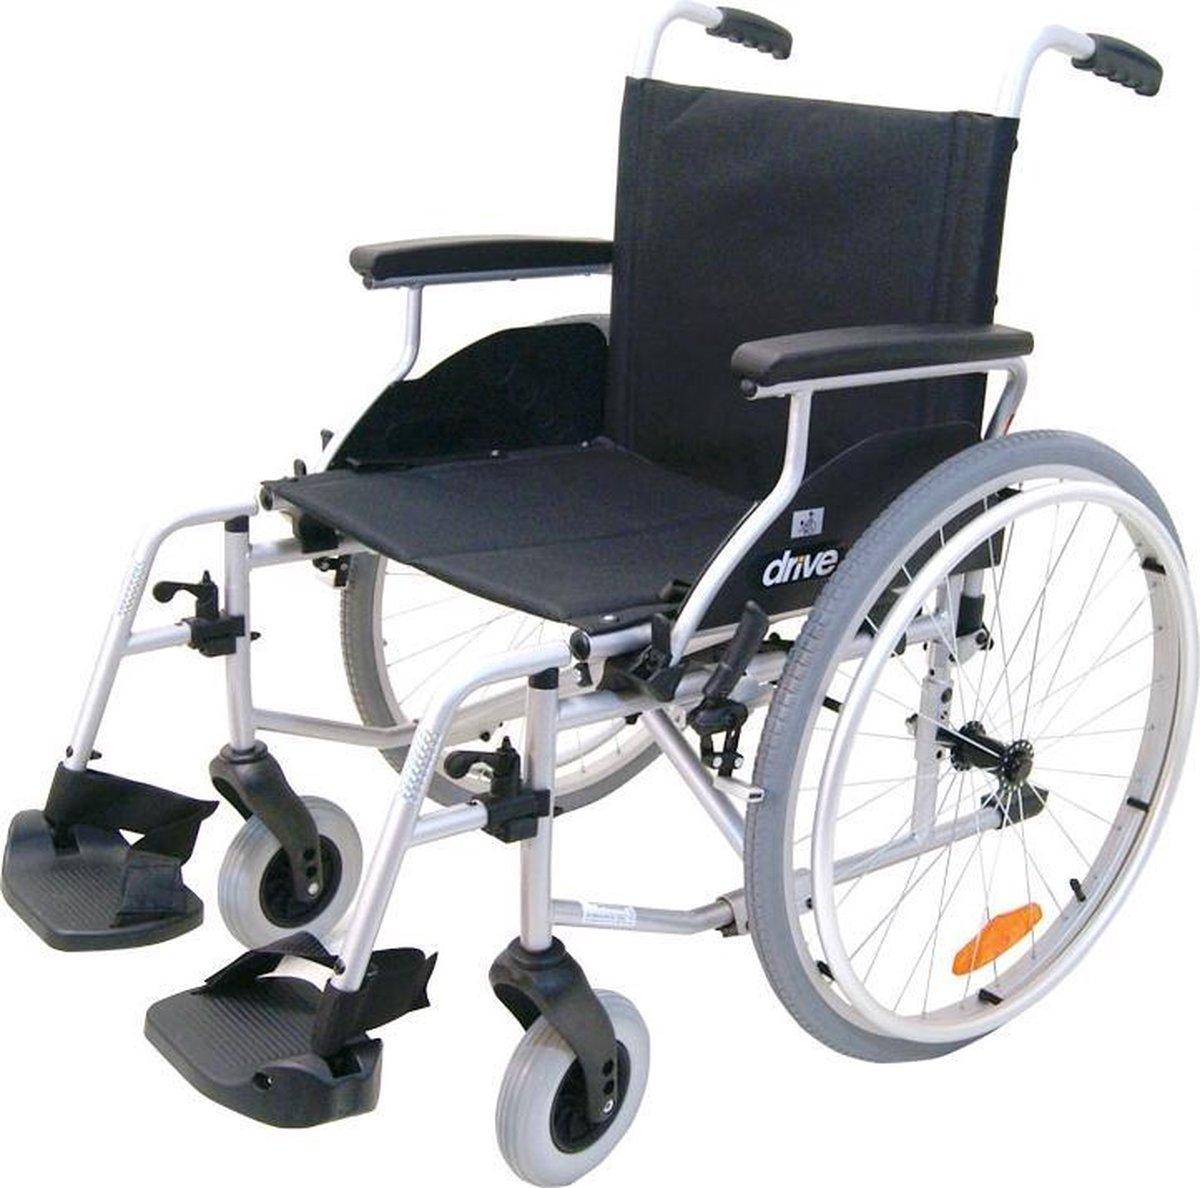 Drive rolstoel ecotec 45 cm breed - Drive